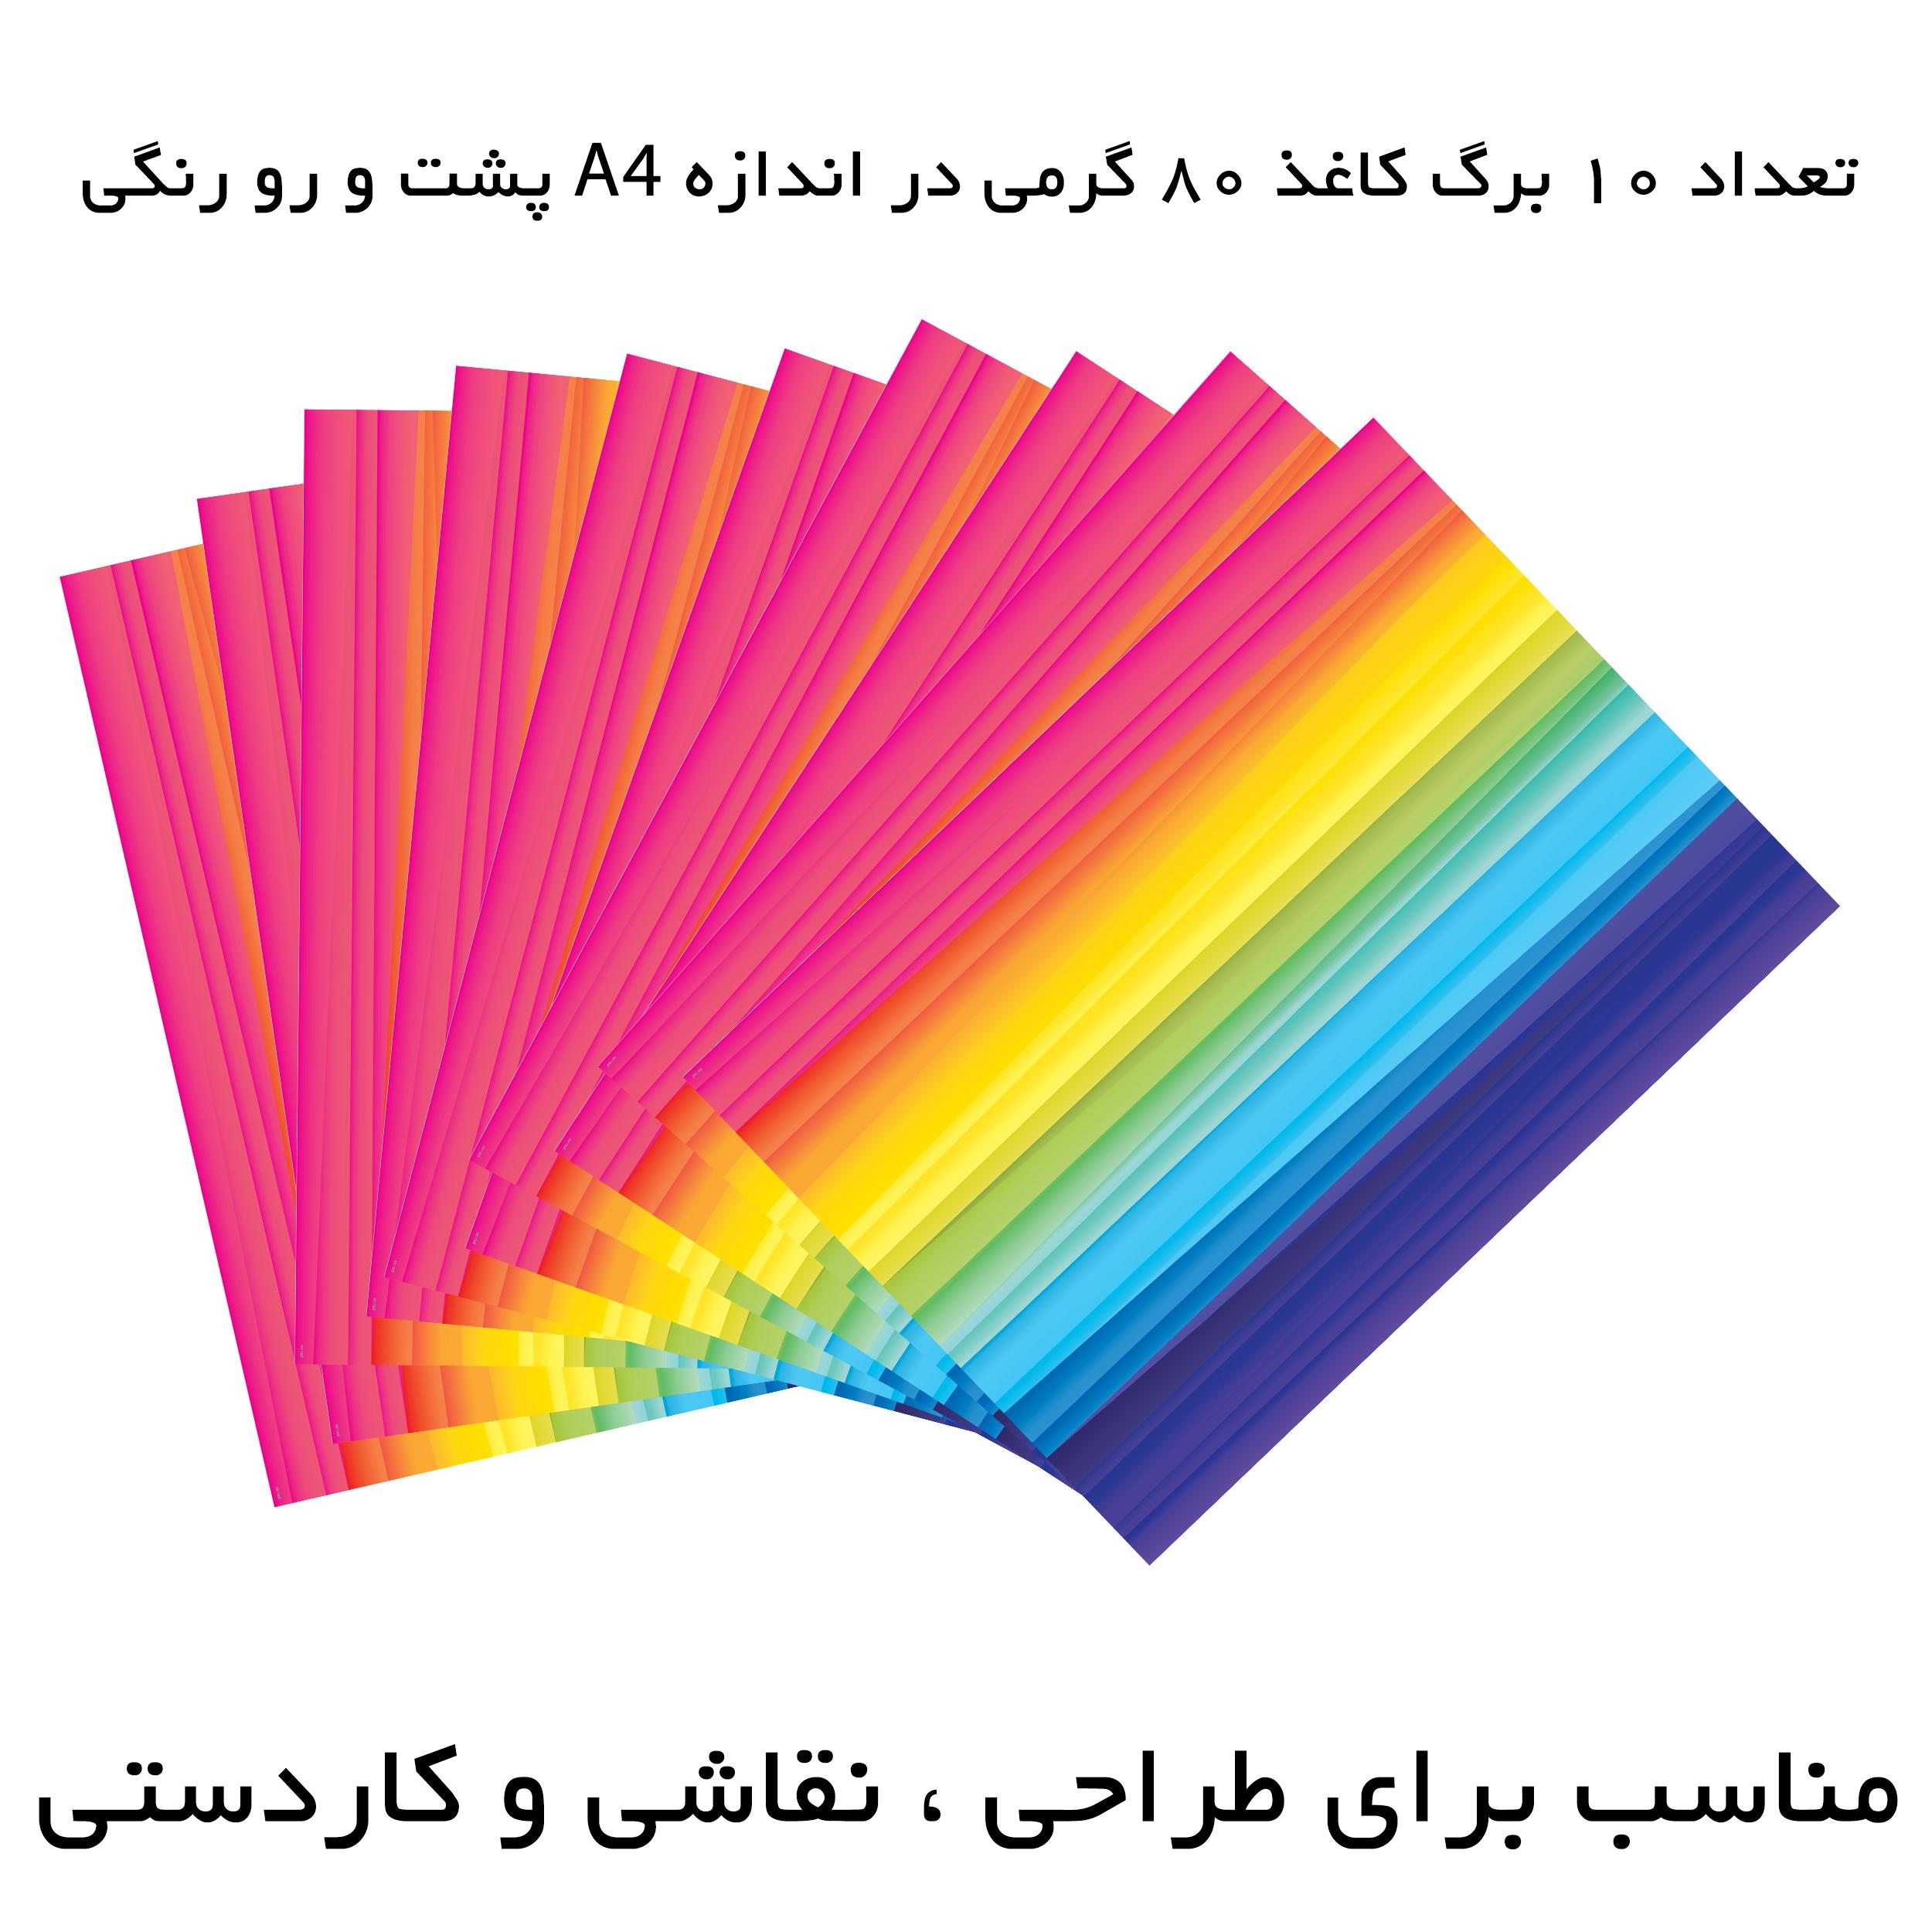 کاغذ رنگی A4 FG مدل رنگارنگ بسته 10 عددی